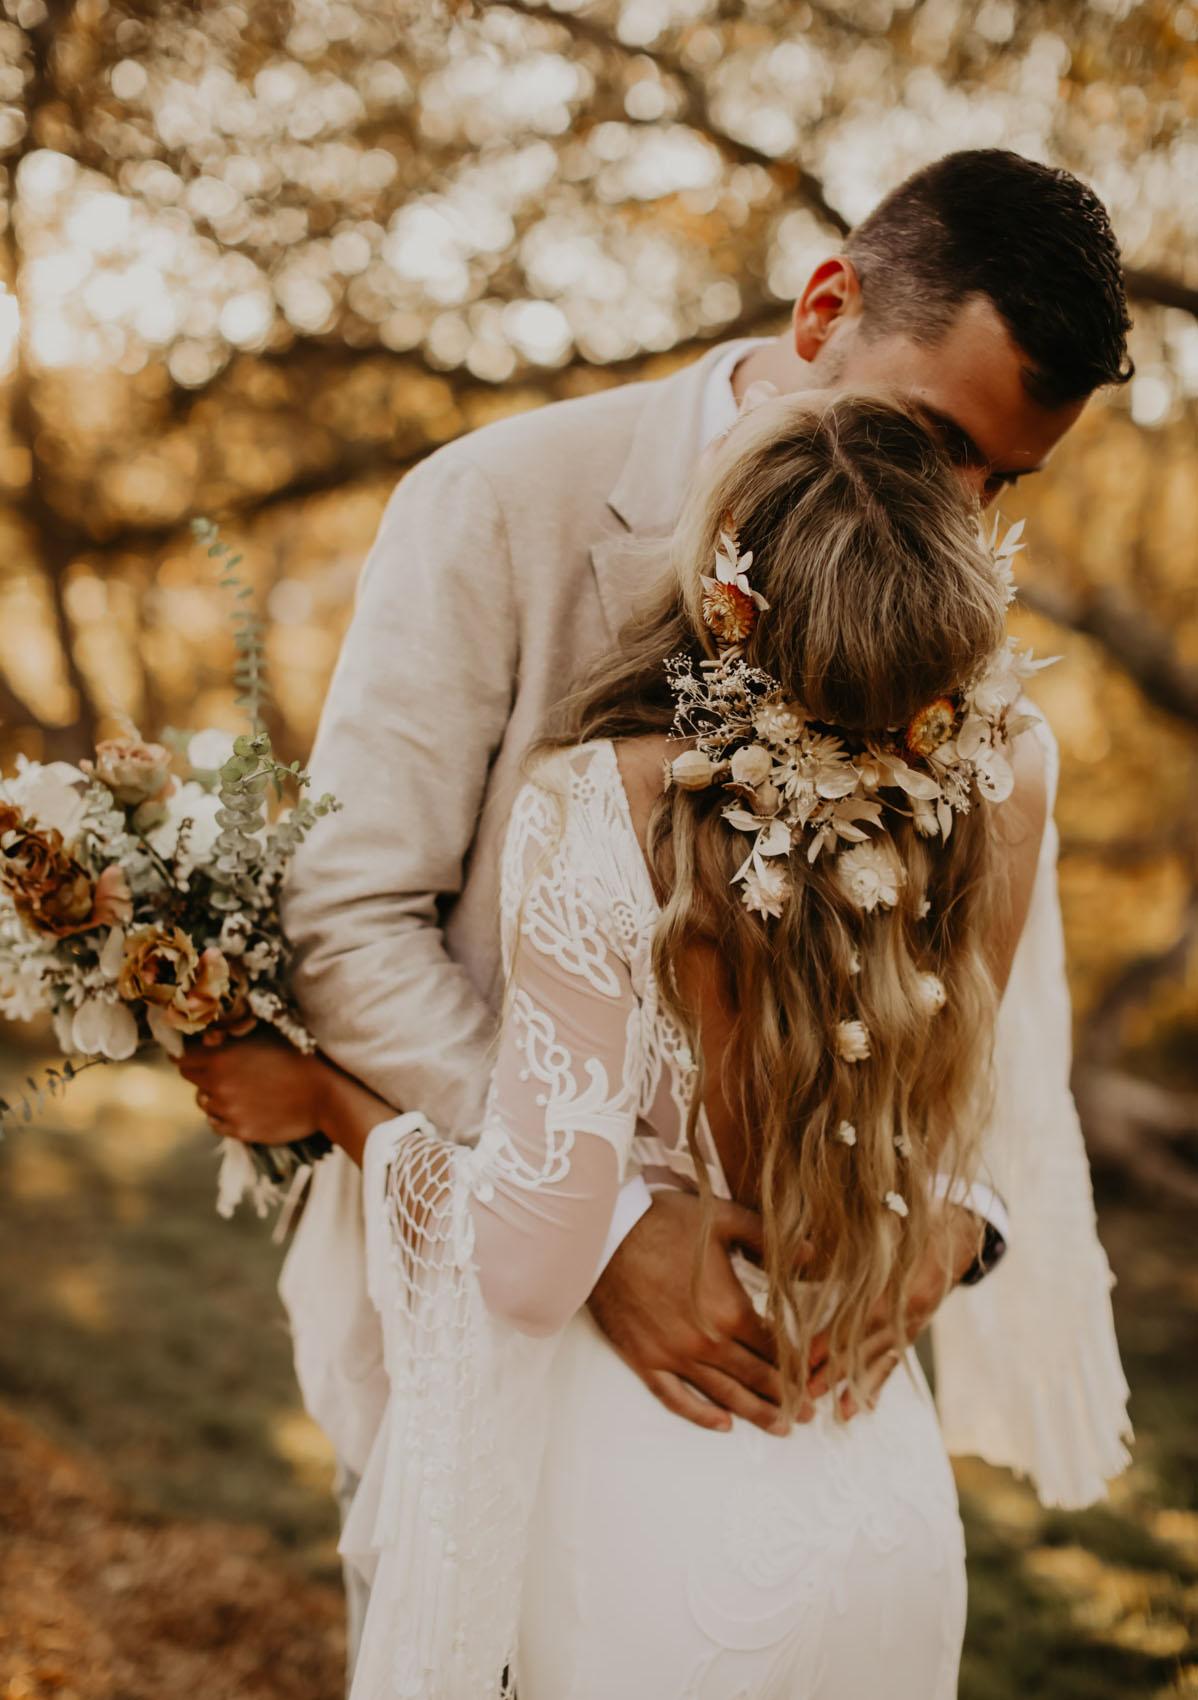 Bruidsfoto tijdens fotoshoot